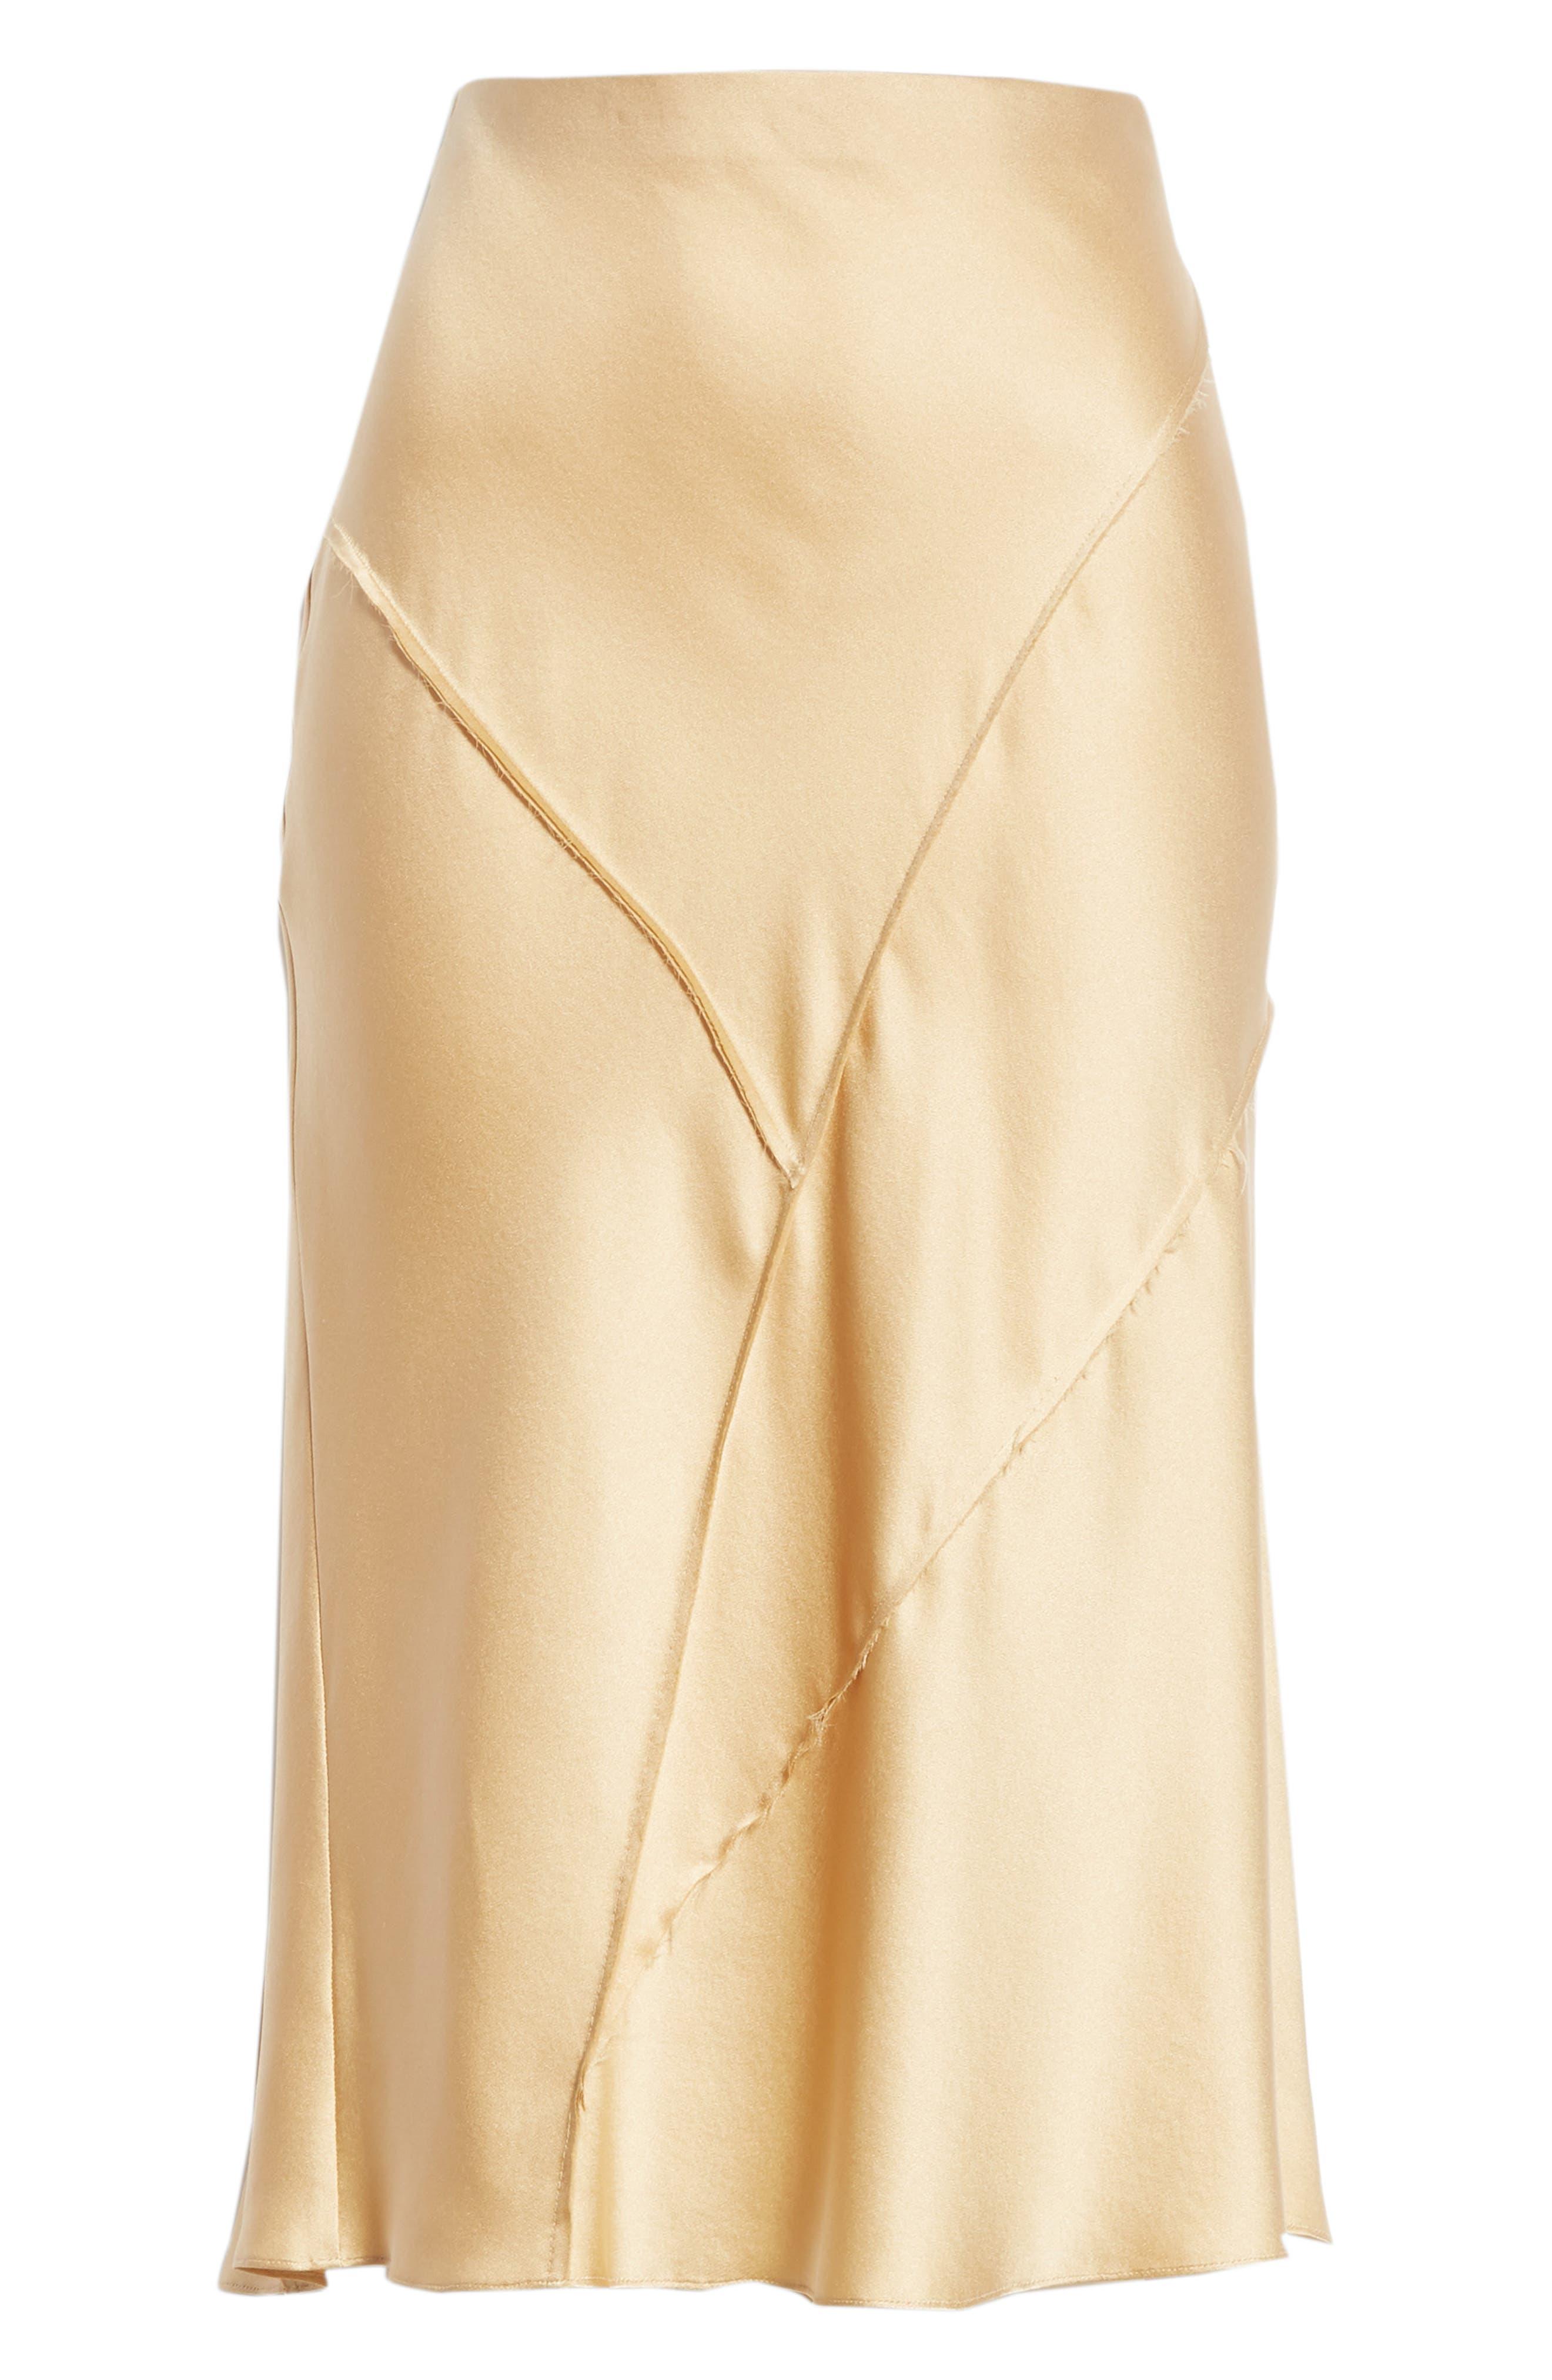 Raw Edge Bias Silk Skirt,                             Alternate thumbnail 6, color,                             GINSENG